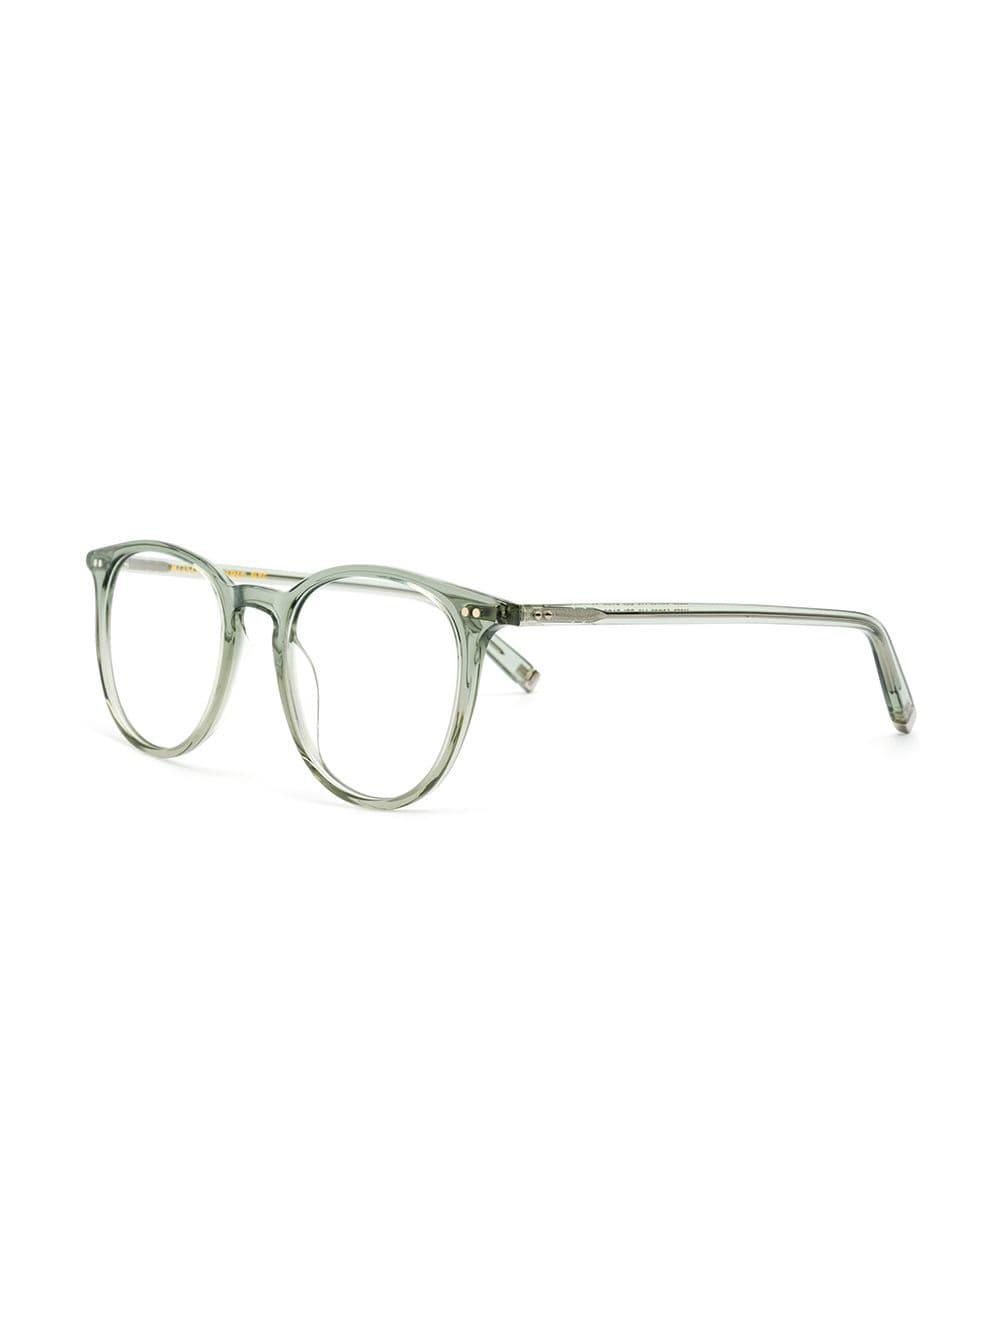 939dc6de4e4 Moscot Jared Sage Glasses in Green - Lyst